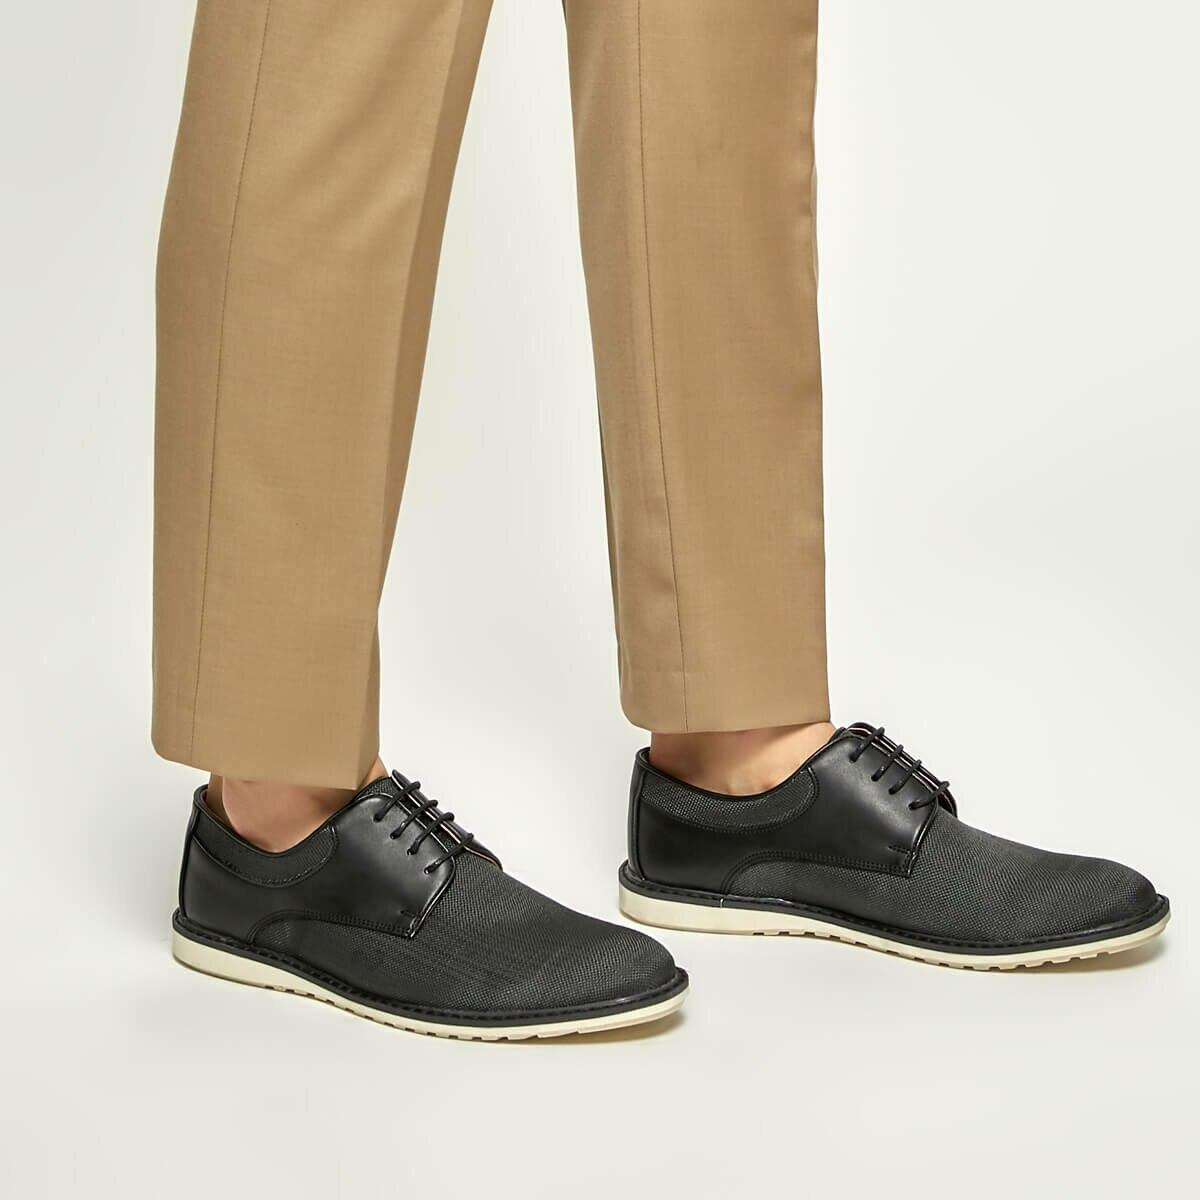 FLO 5700-1 Black Men 'S Classic Shoes JJ-Stiller